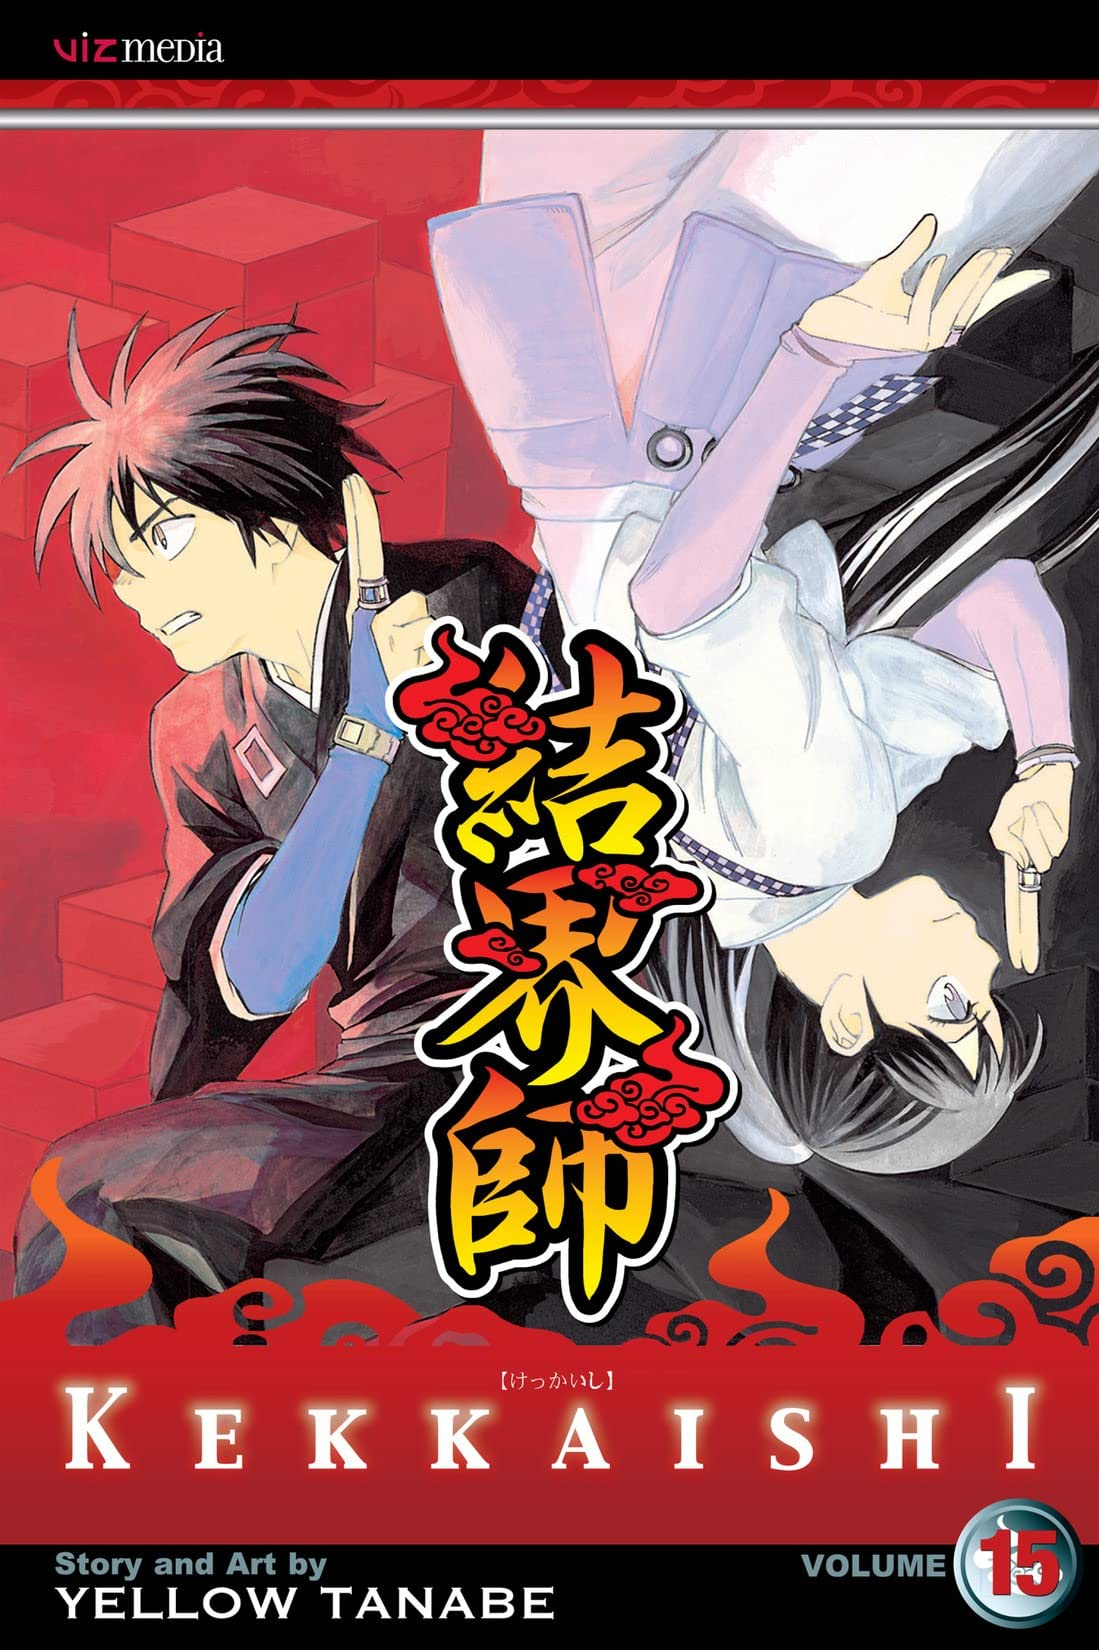 Kekkaishi Vol. 15